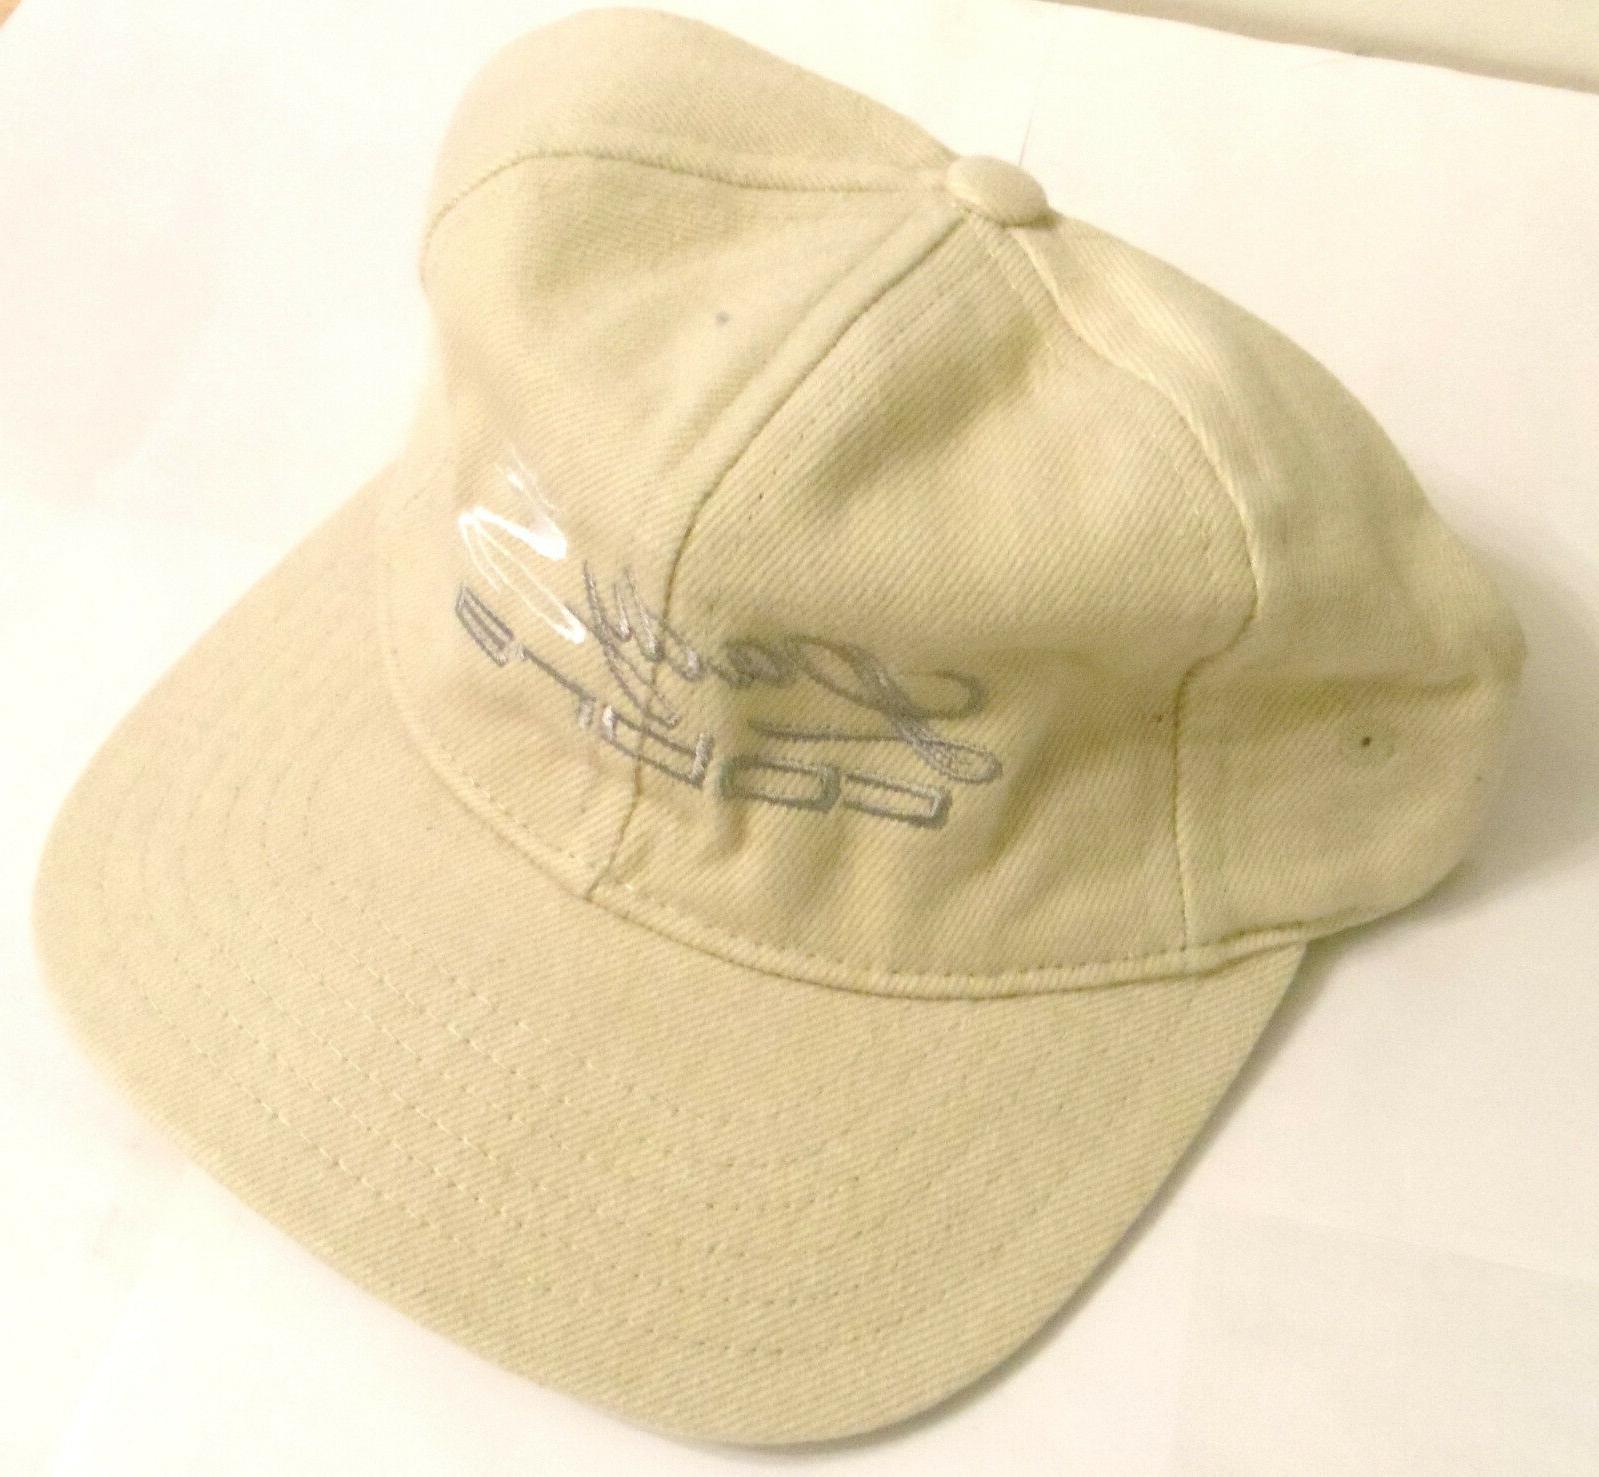 lady hat off white denim material adjustable